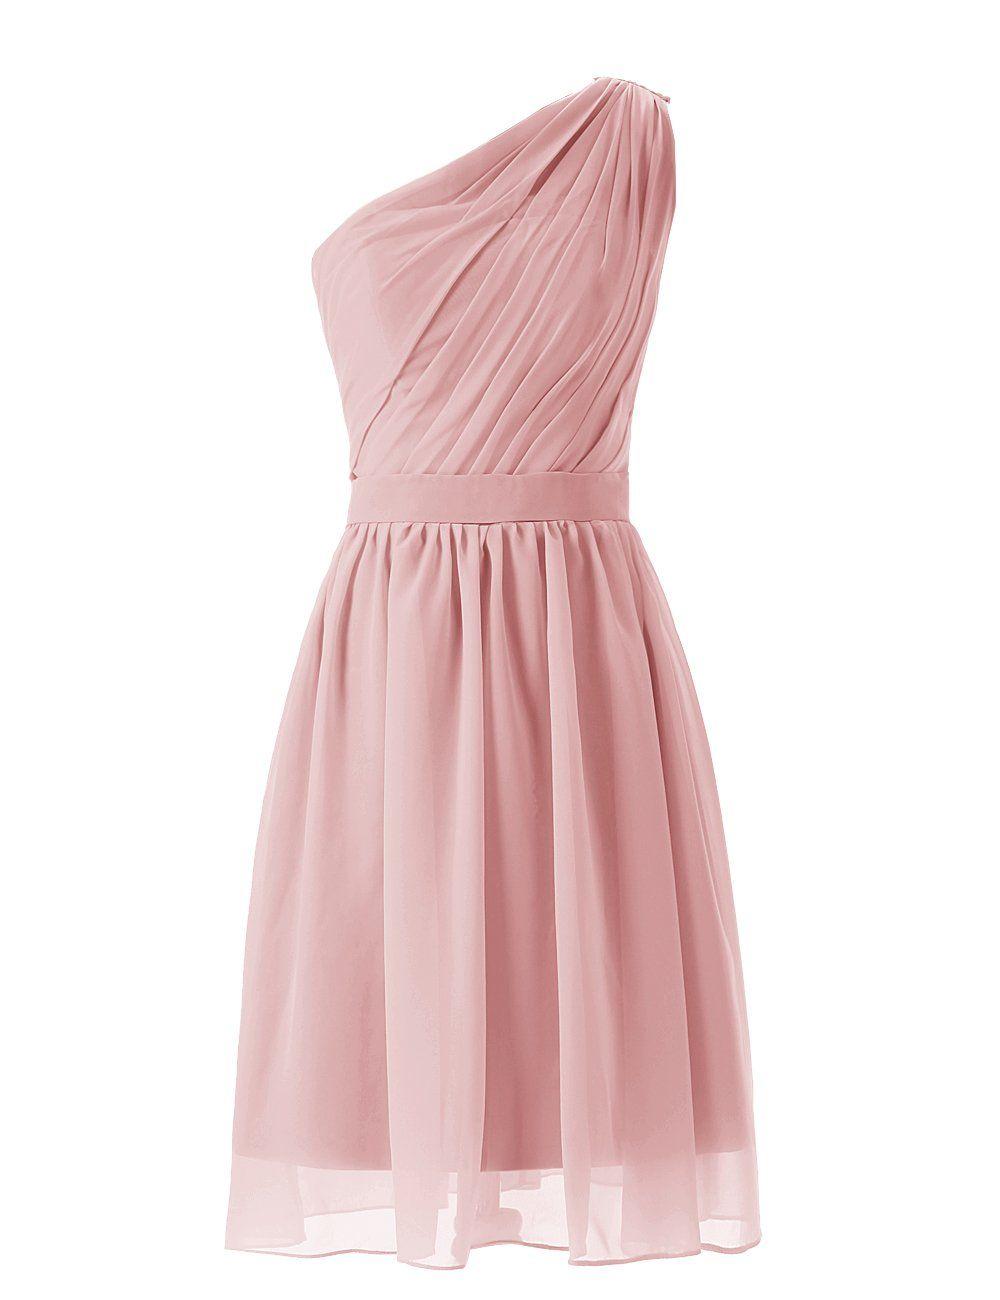 Dresstells short oneshoulder mint bridesmaid dress party dresses